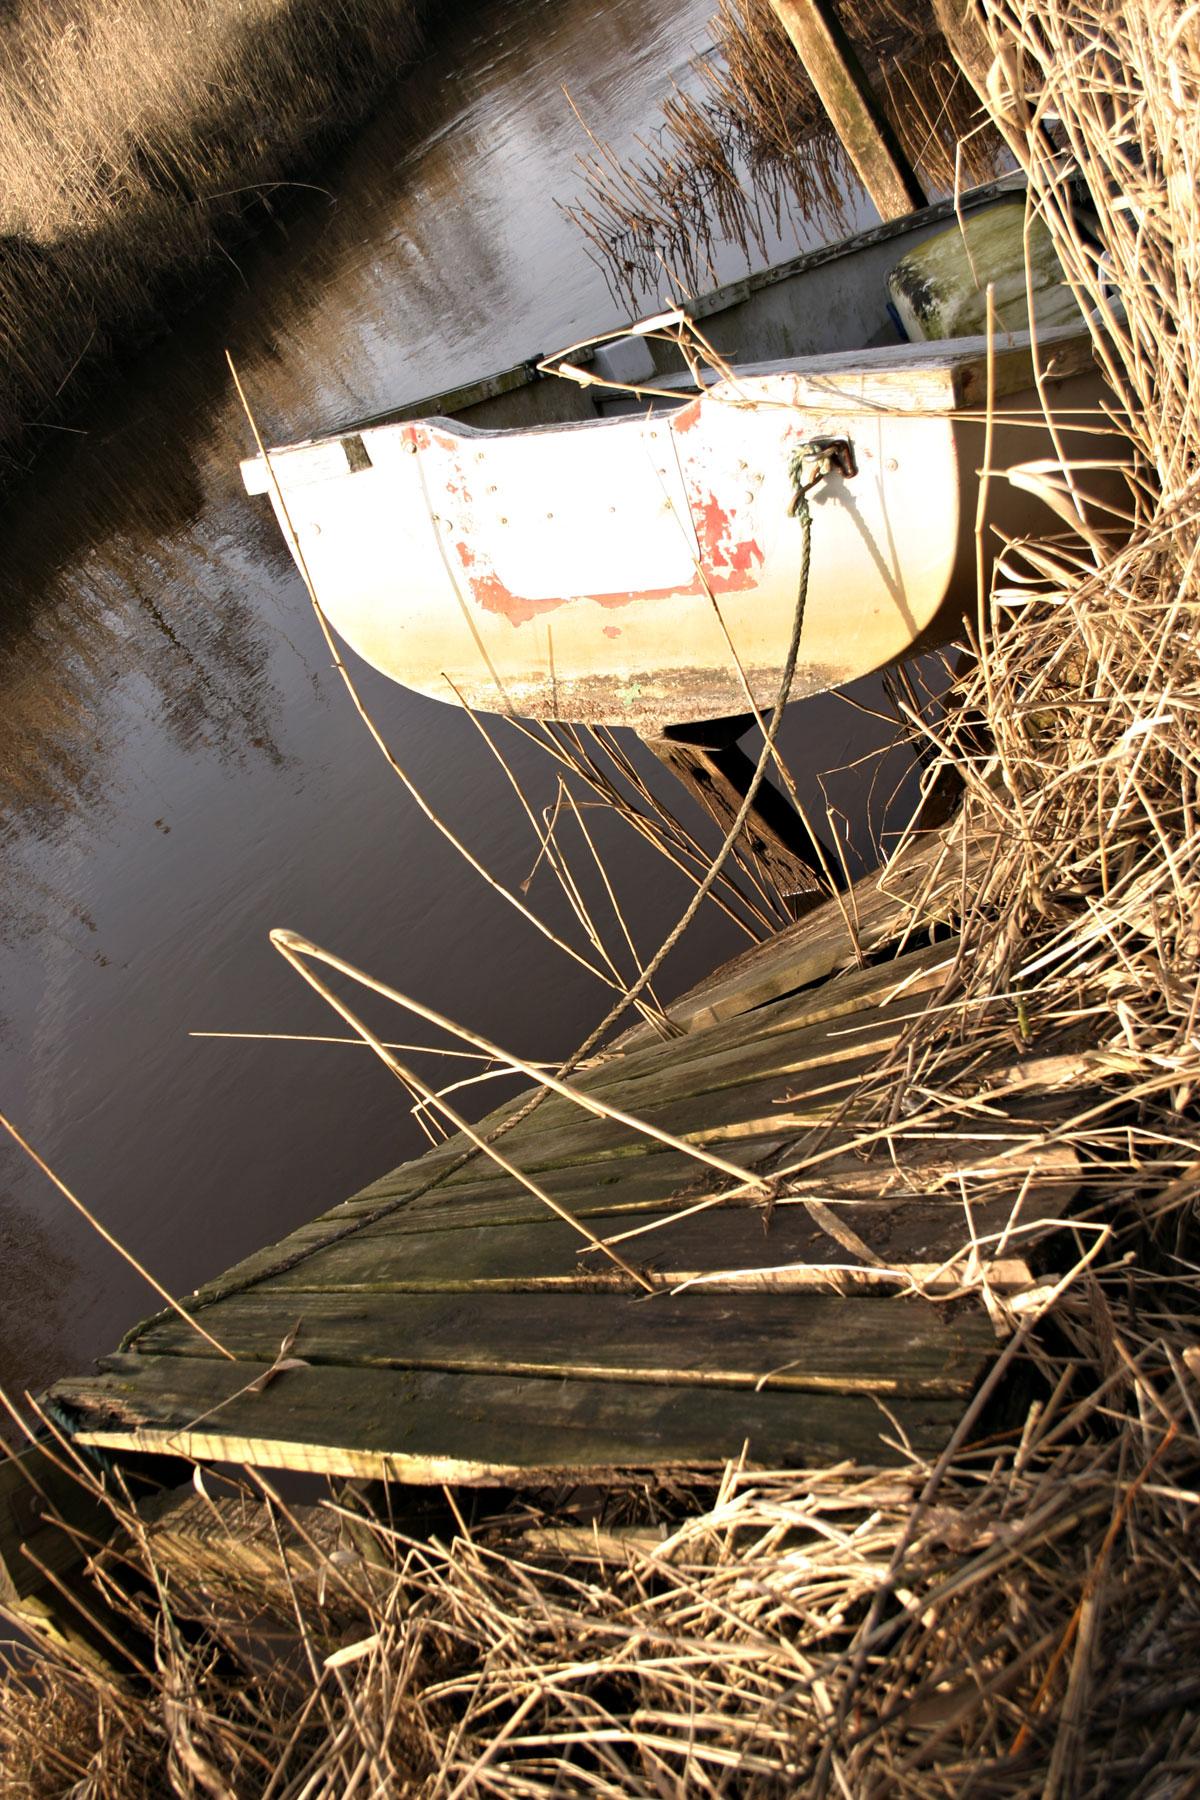 Old boat, Boat, Broken, Grass, Old, HQ Photo